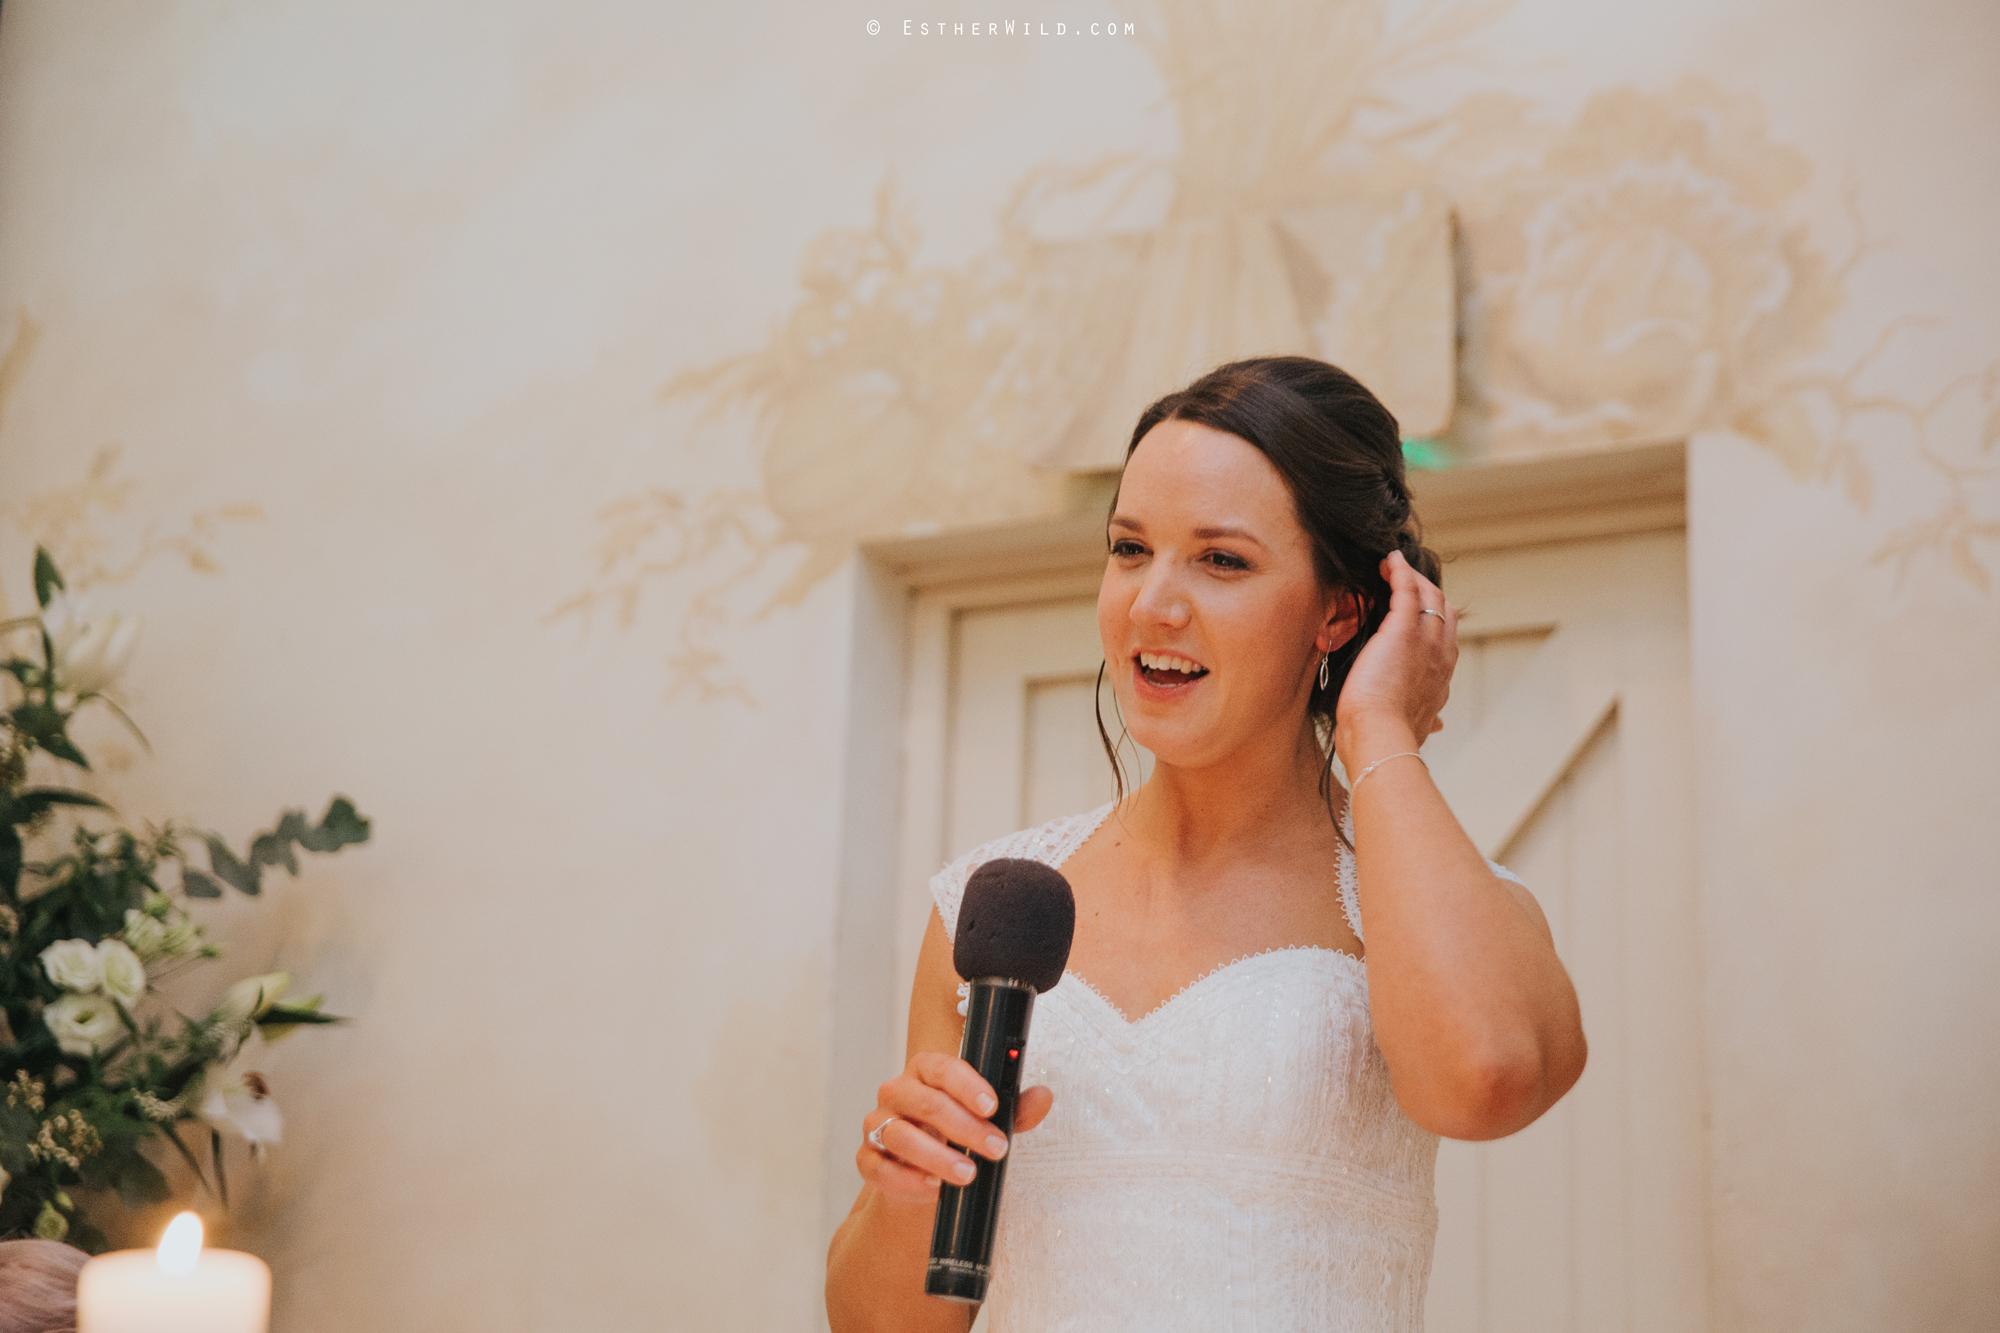 Elms_Barn_Weddings_Suffolk_Photographer_Copyright_Esther_Wild_IMG_2758.jpg